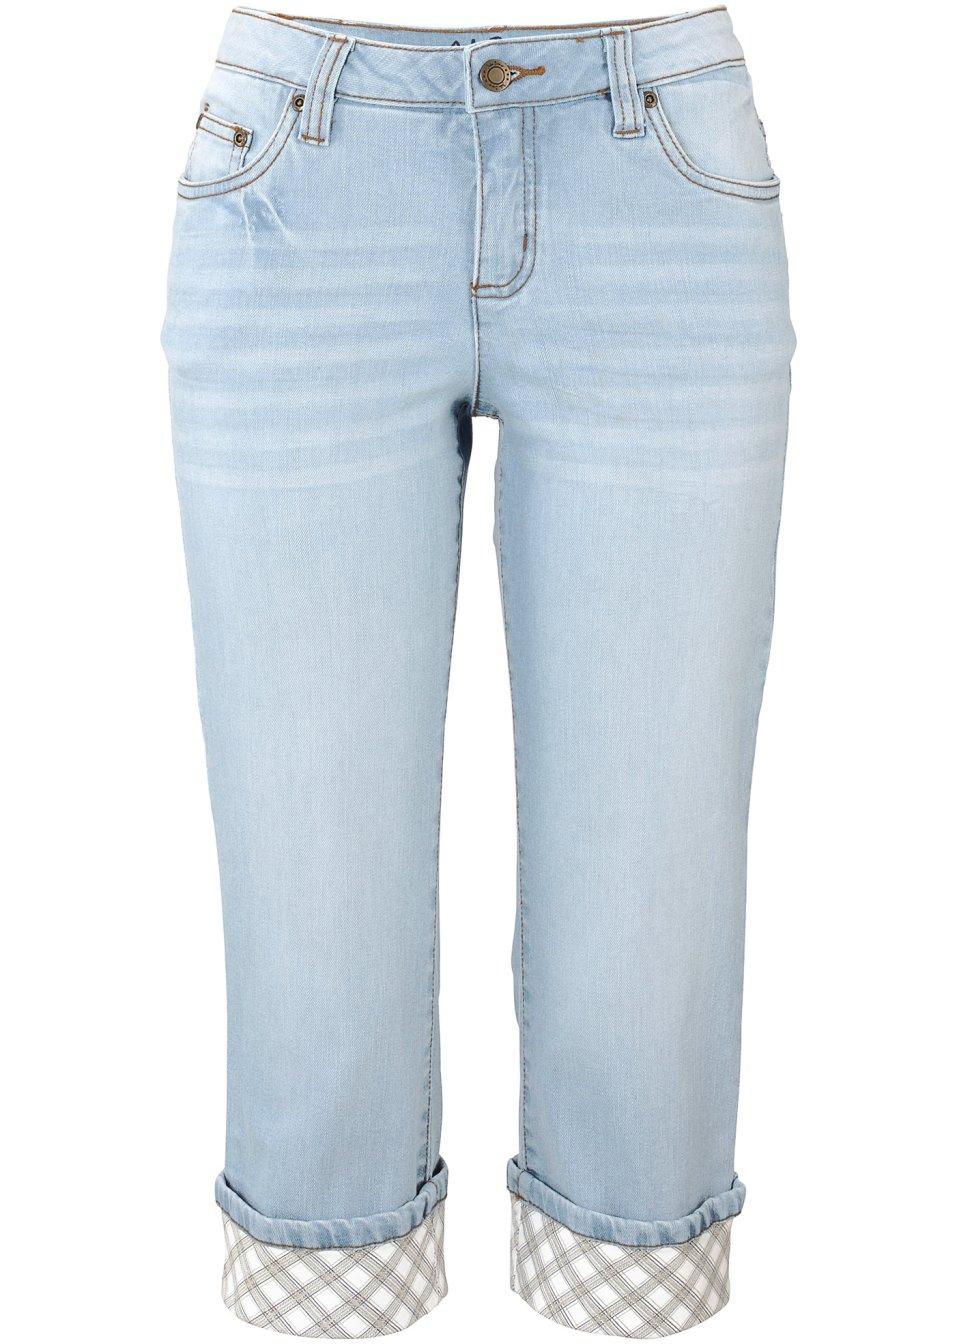 Capri-Jeans im Used-Look für sportliche Outfits - hellblau/kariert Normal Zc8D1 oyCJn